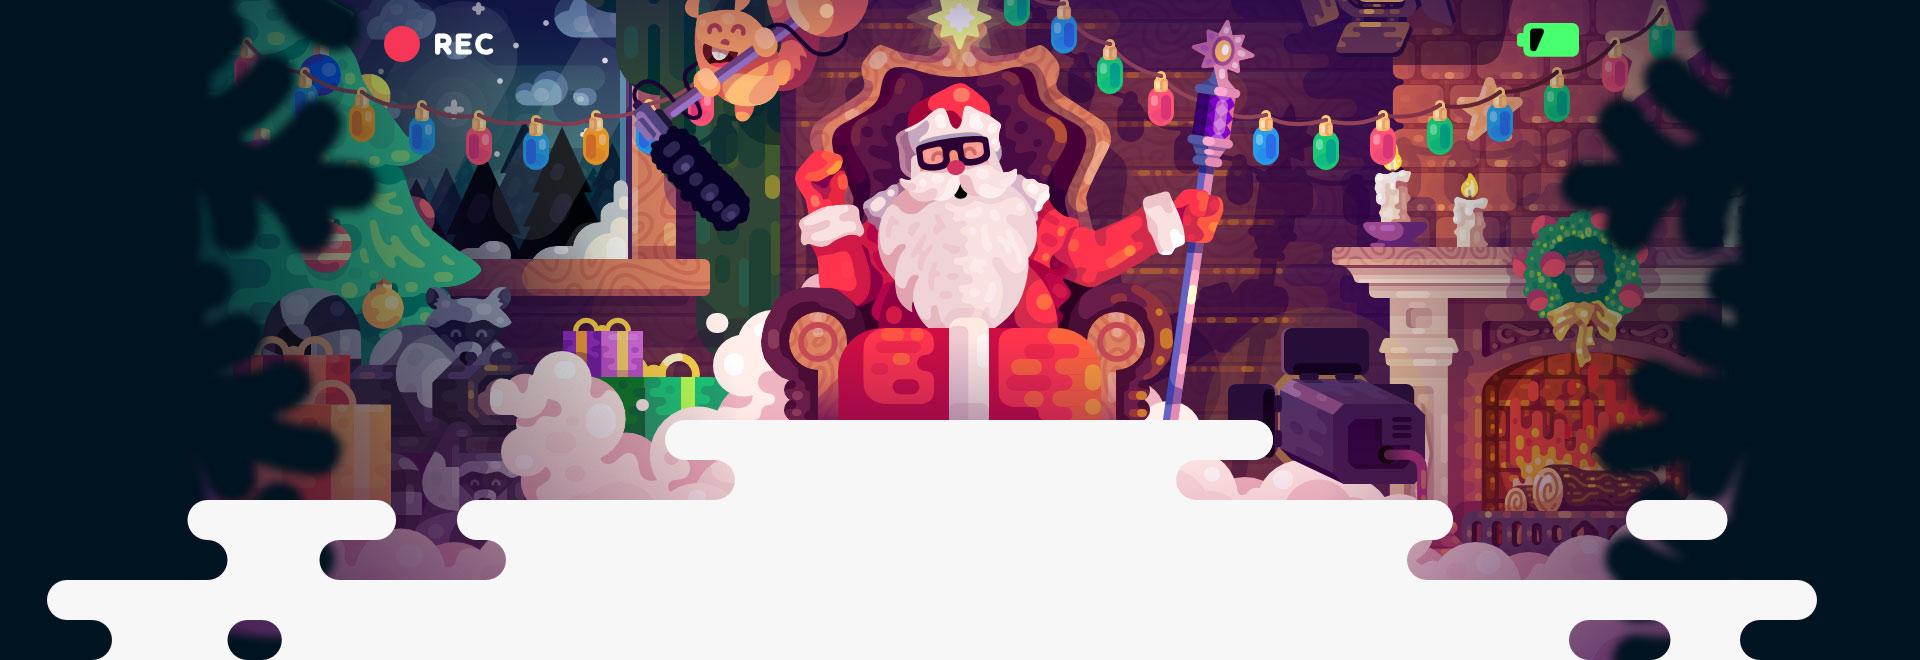 видео поздравление Деда Мороза